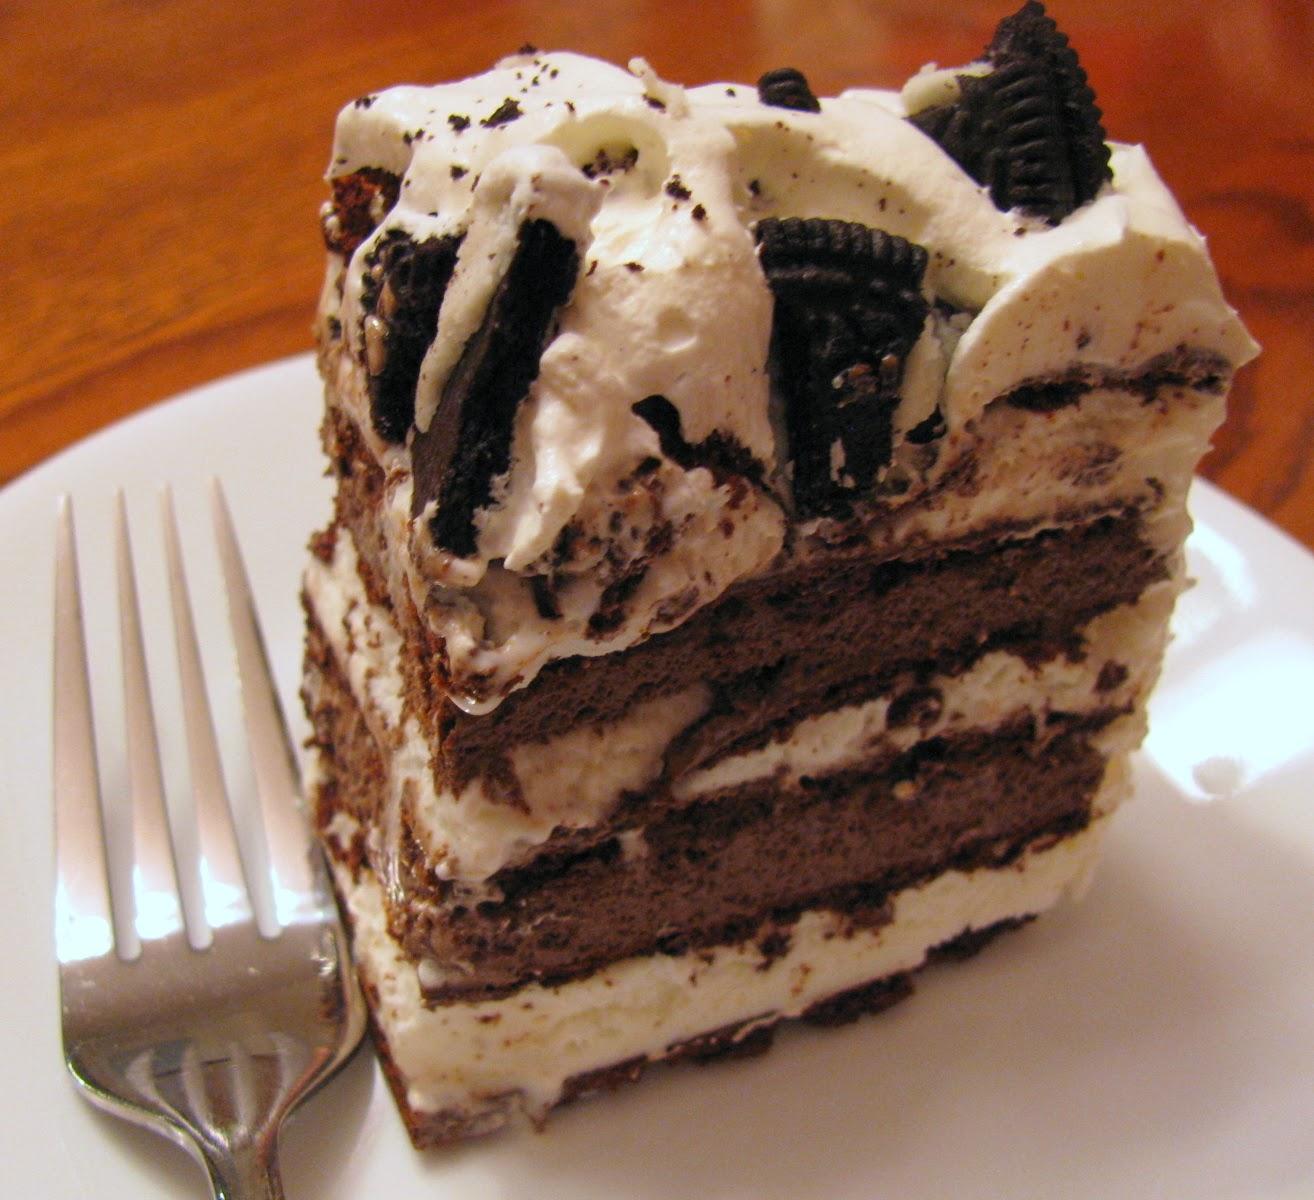 Ice Cream Sandwich Cake Images : Creative Home Designs - Recipes,Interior Home Design : Ice ...